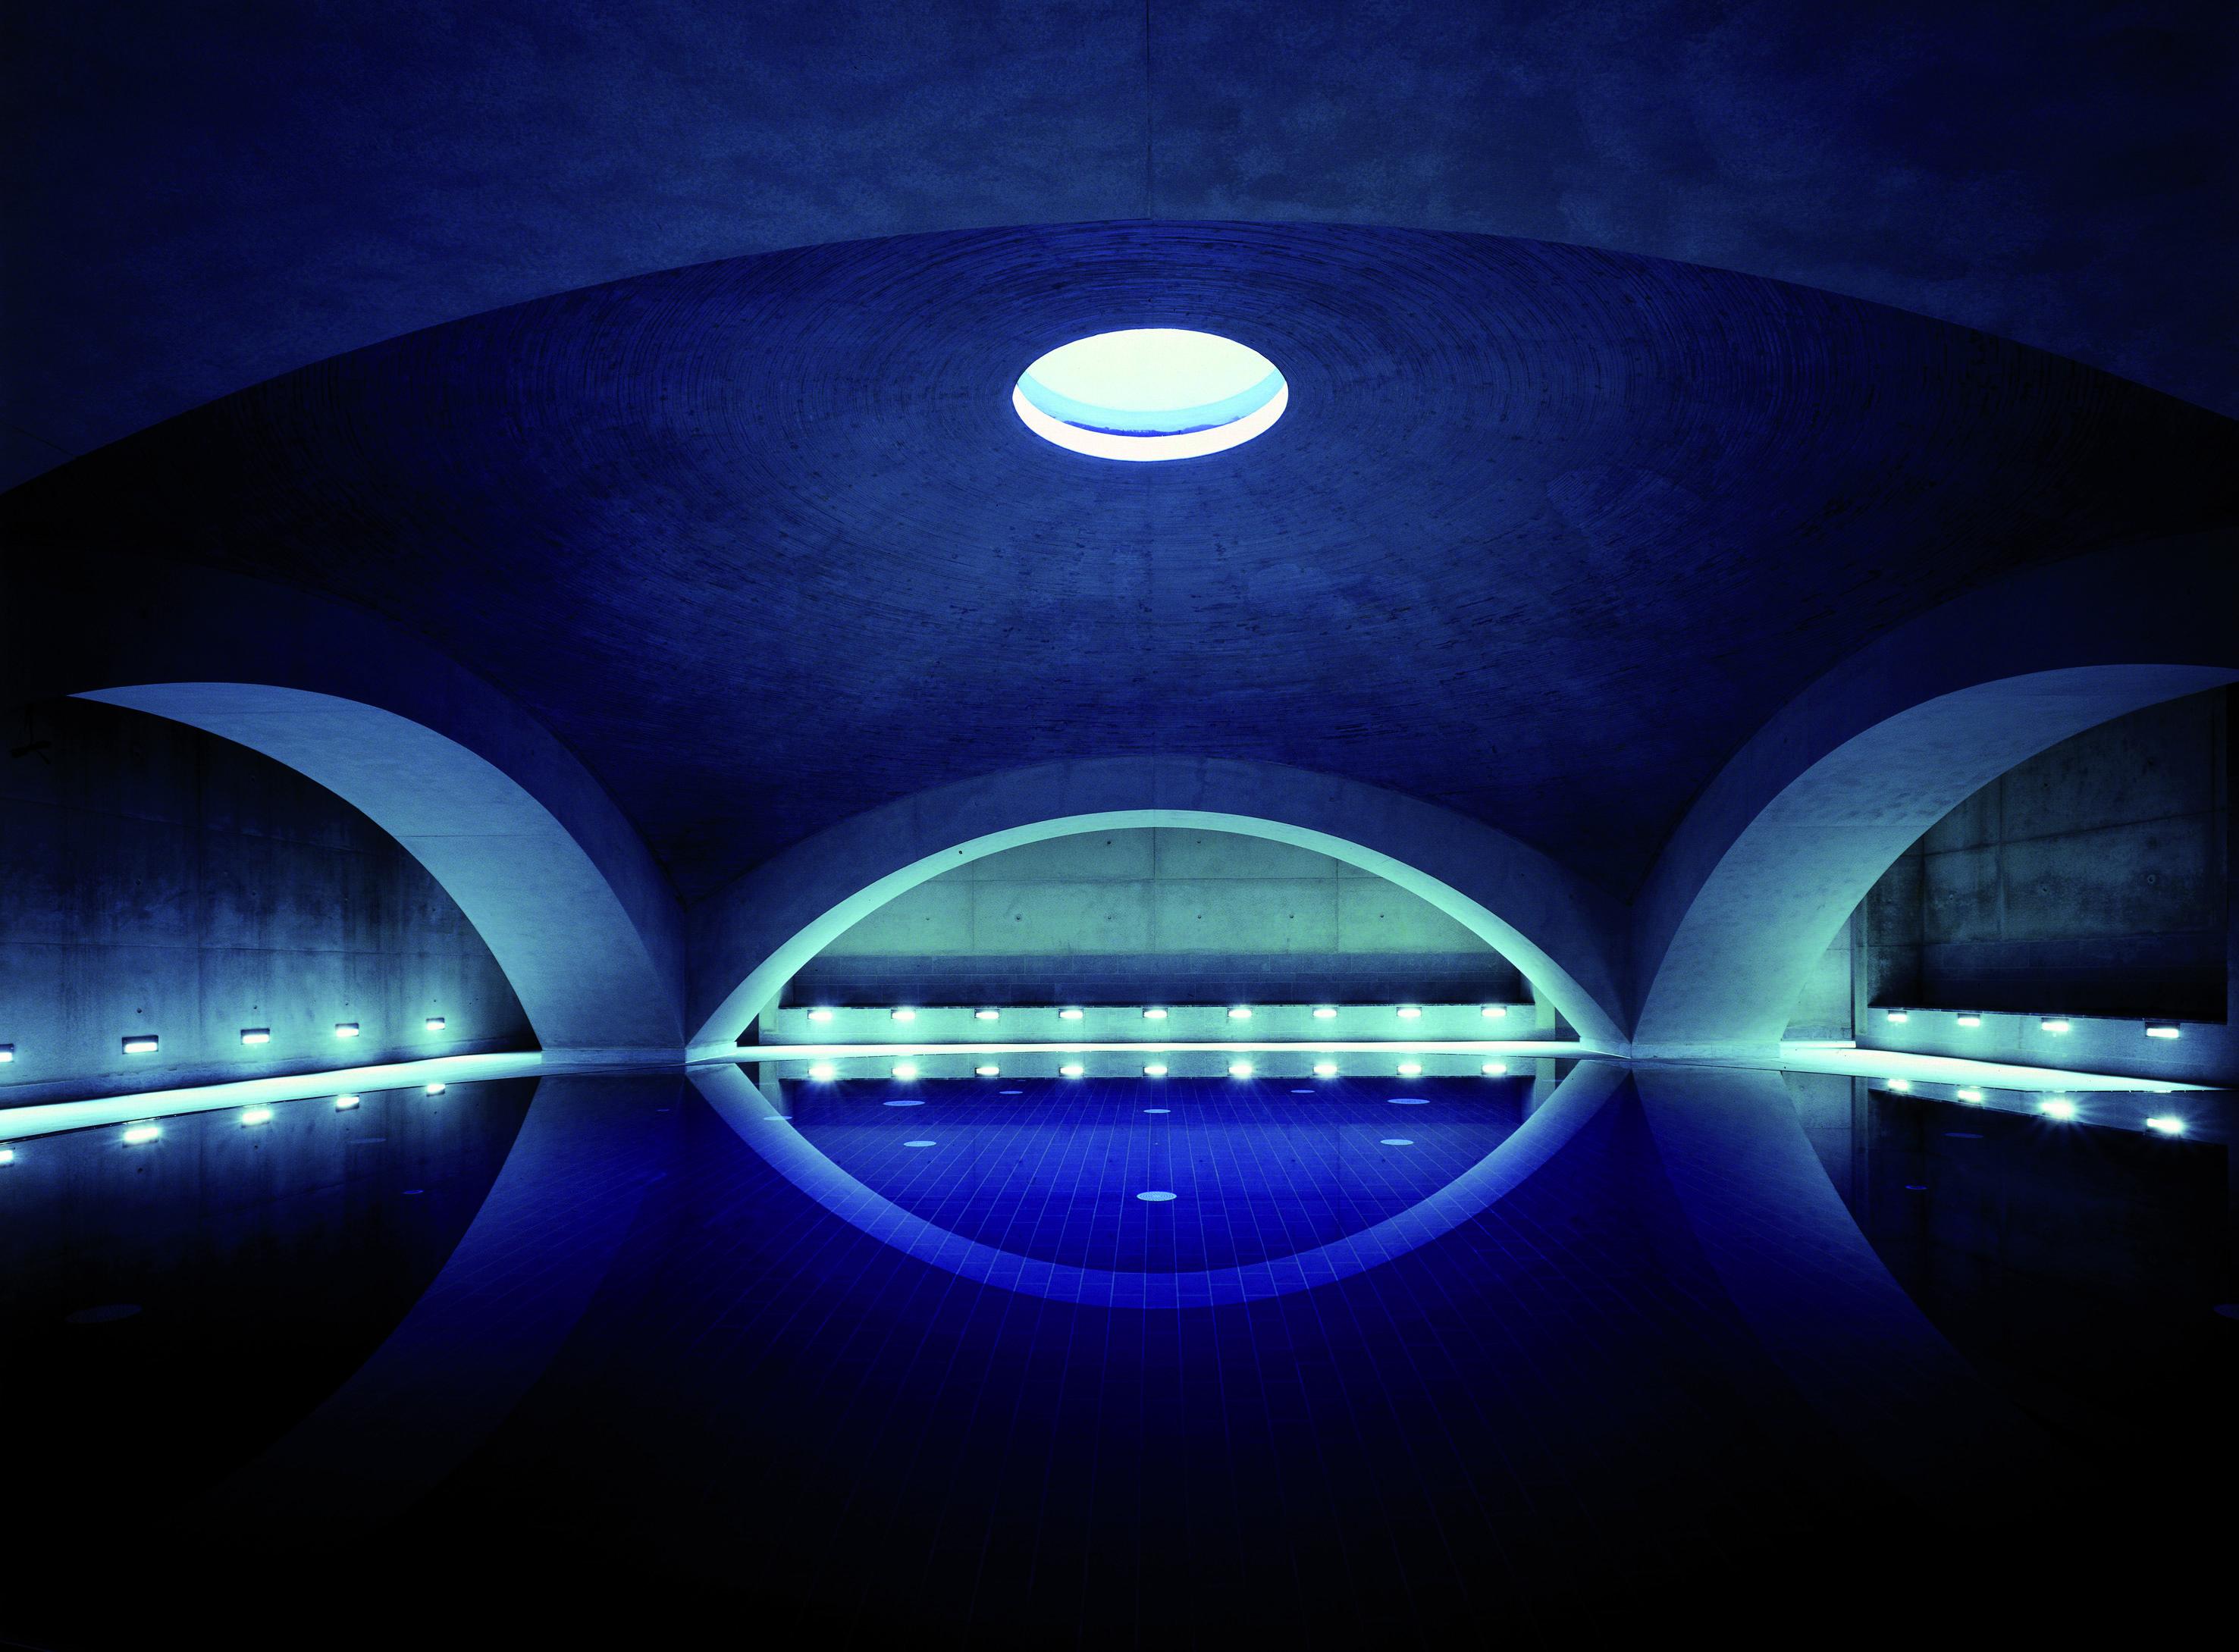 Neues Tempodrom Berlin, Liquidrom - alien aliens